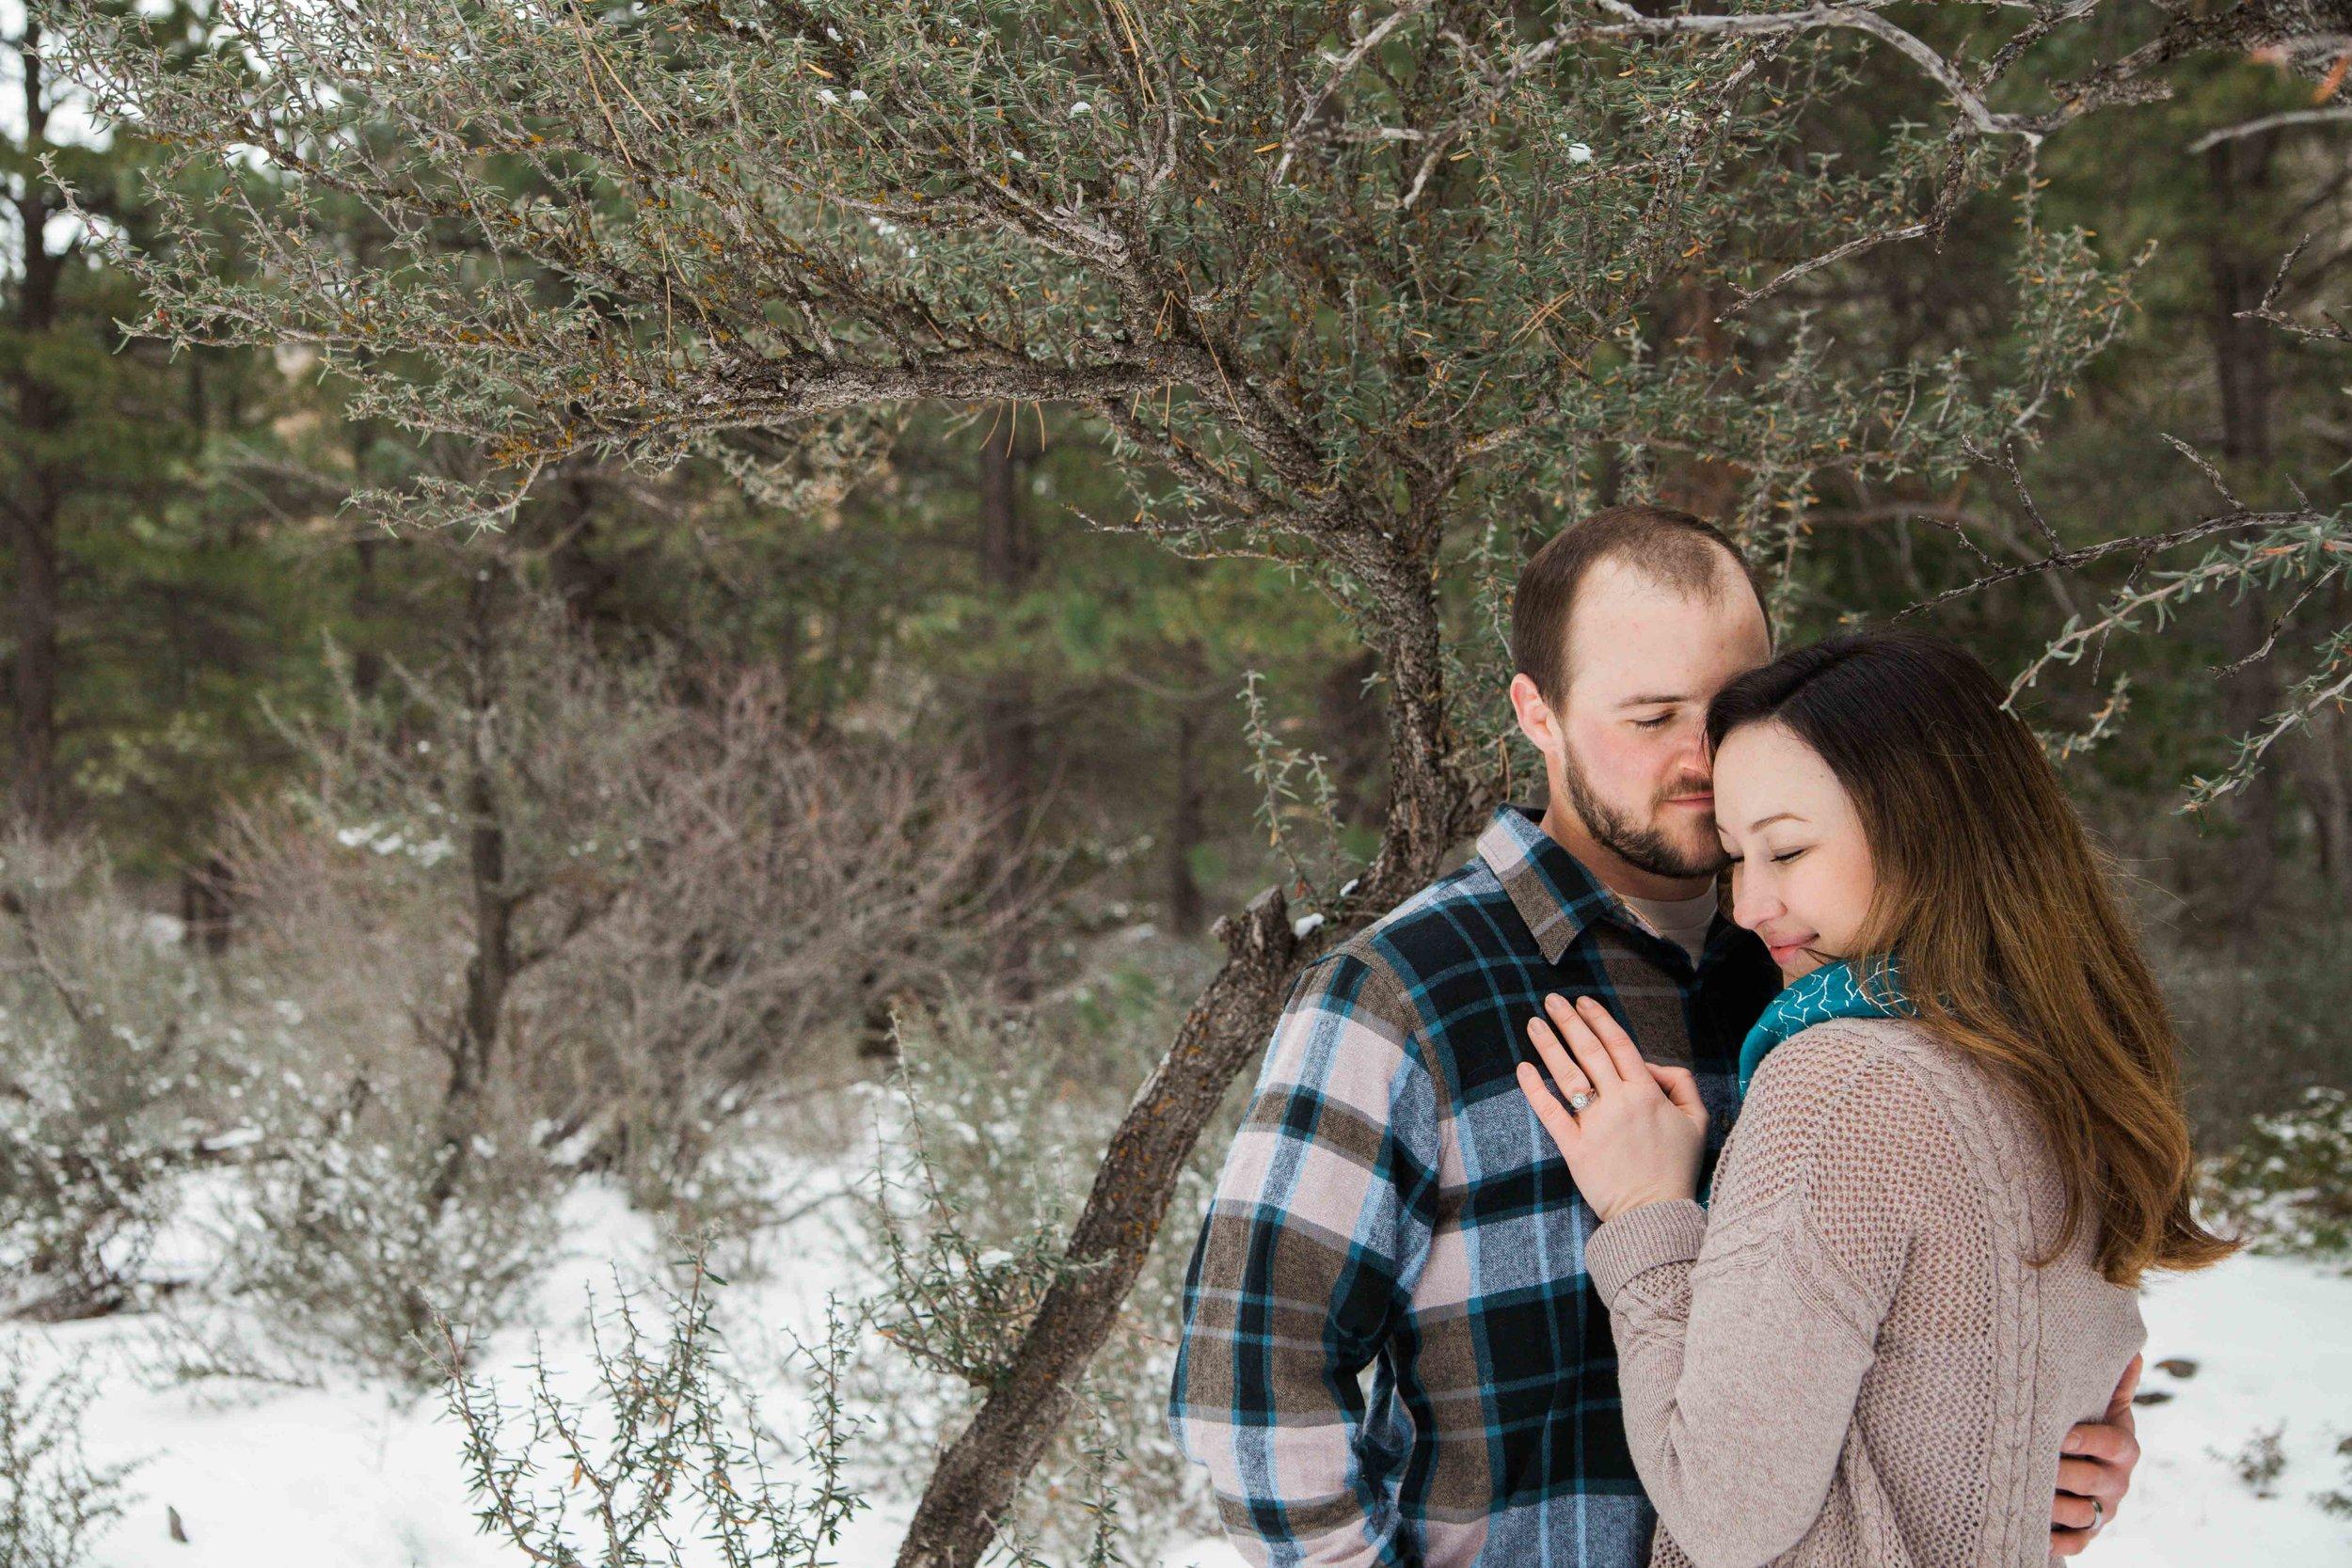 Sheridan Wyoming - Kerns Photography - Professional Photographer - Engagements & Weddings